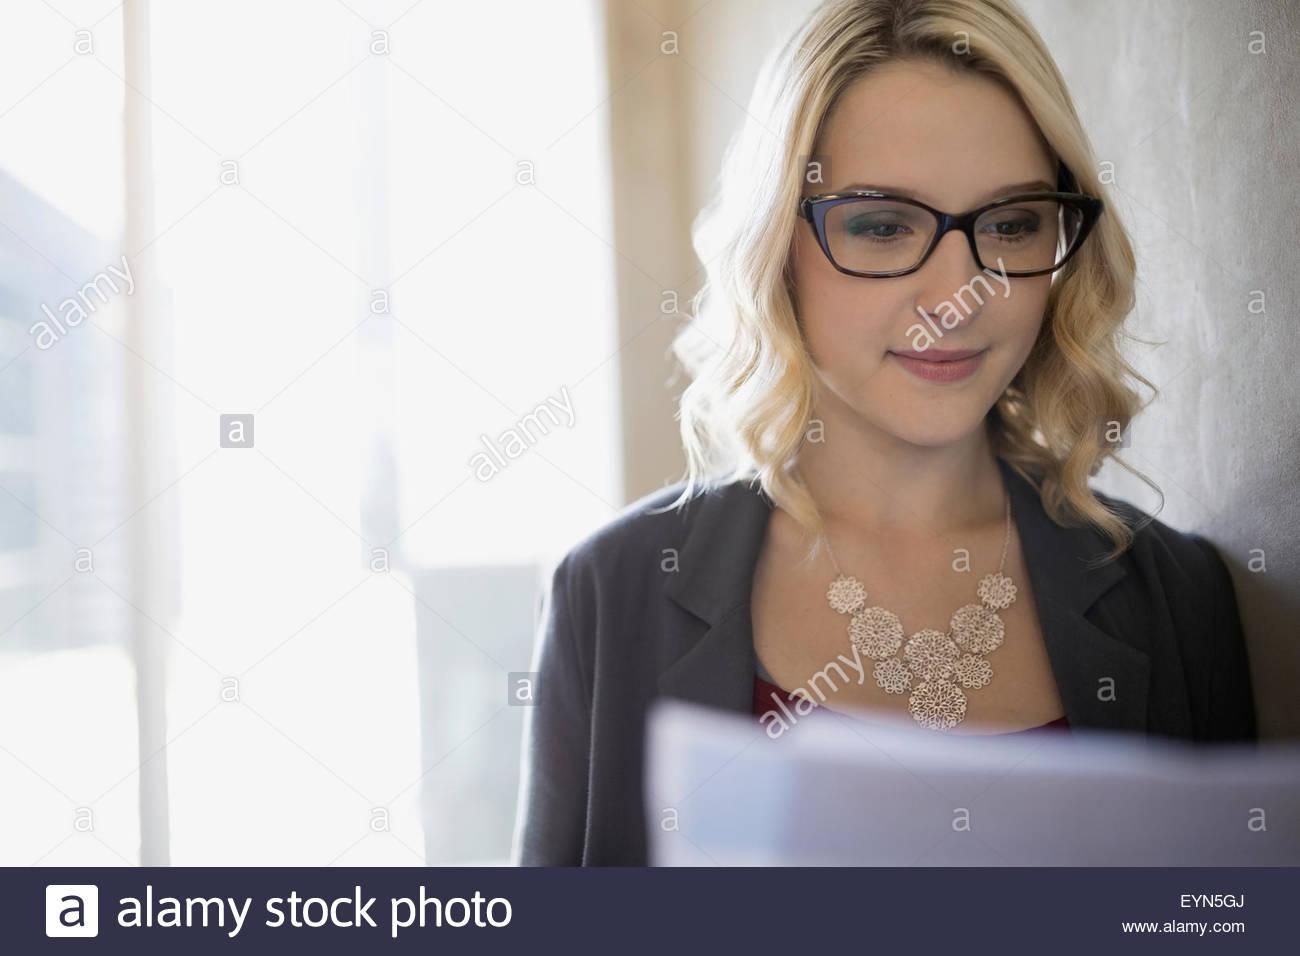 Focused blonde businesswoman reading paperwork - Stock Image